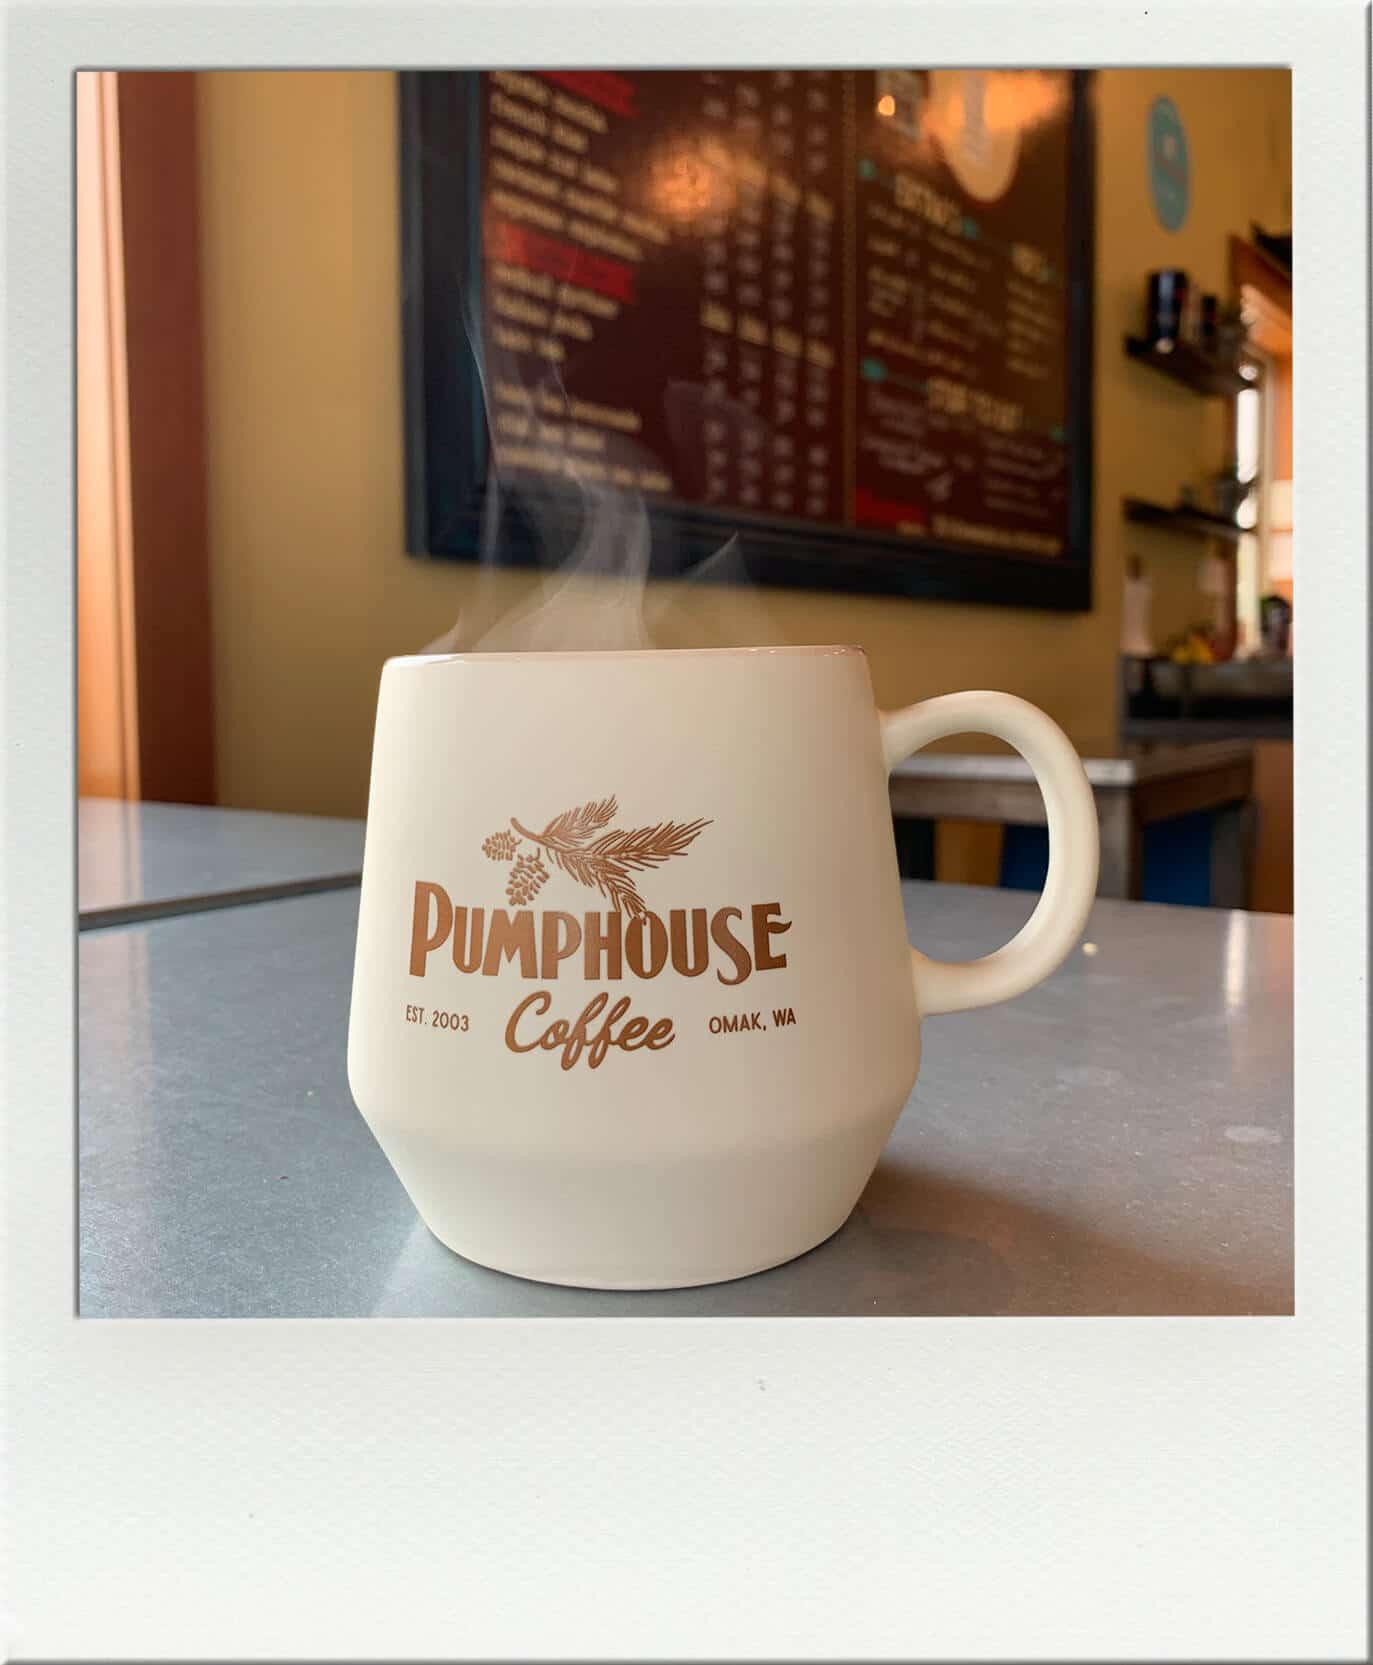 Pumphouse Coffee Company Omak Coffee in a mug